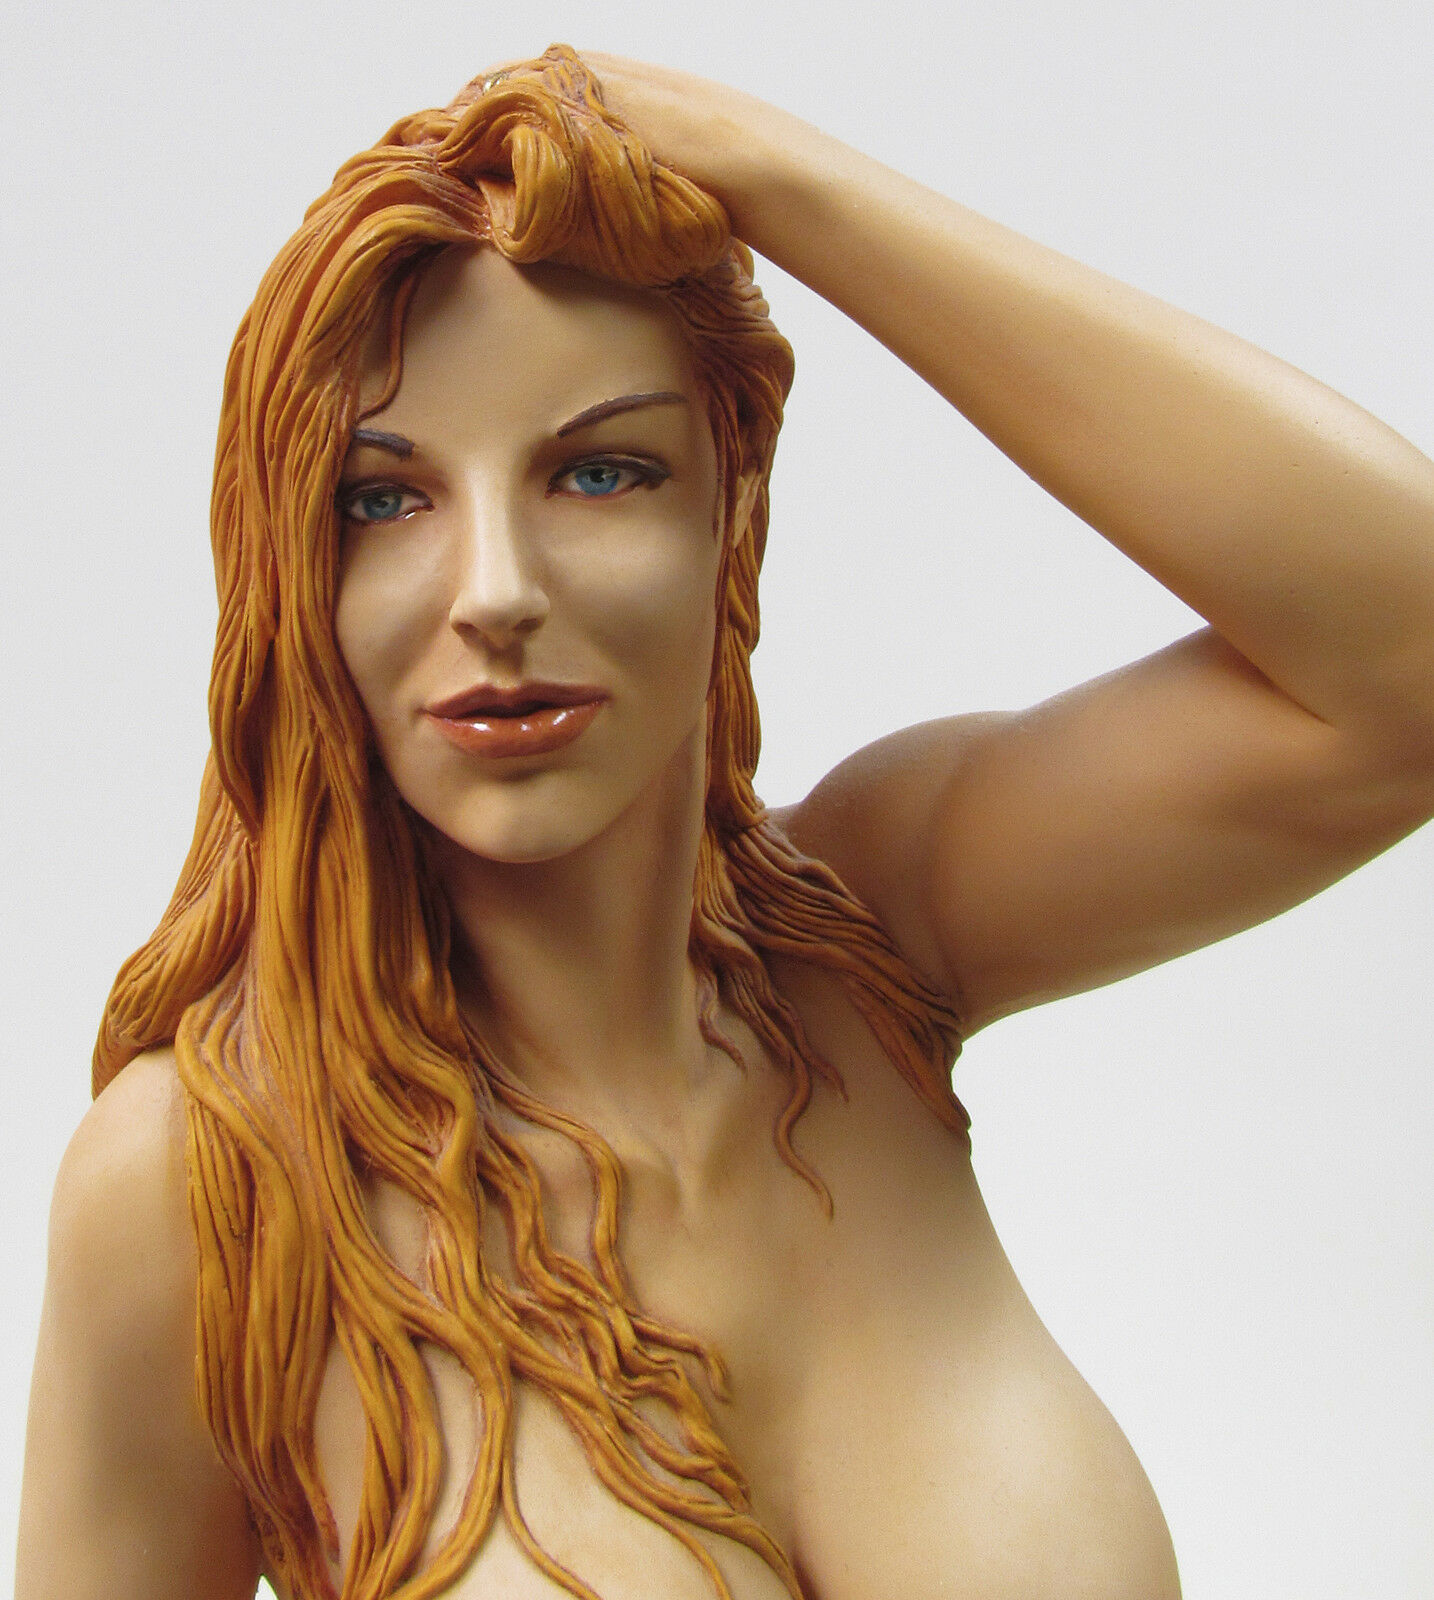 Lf14 jimmy flintstone sex am strand von sandy harz - modell